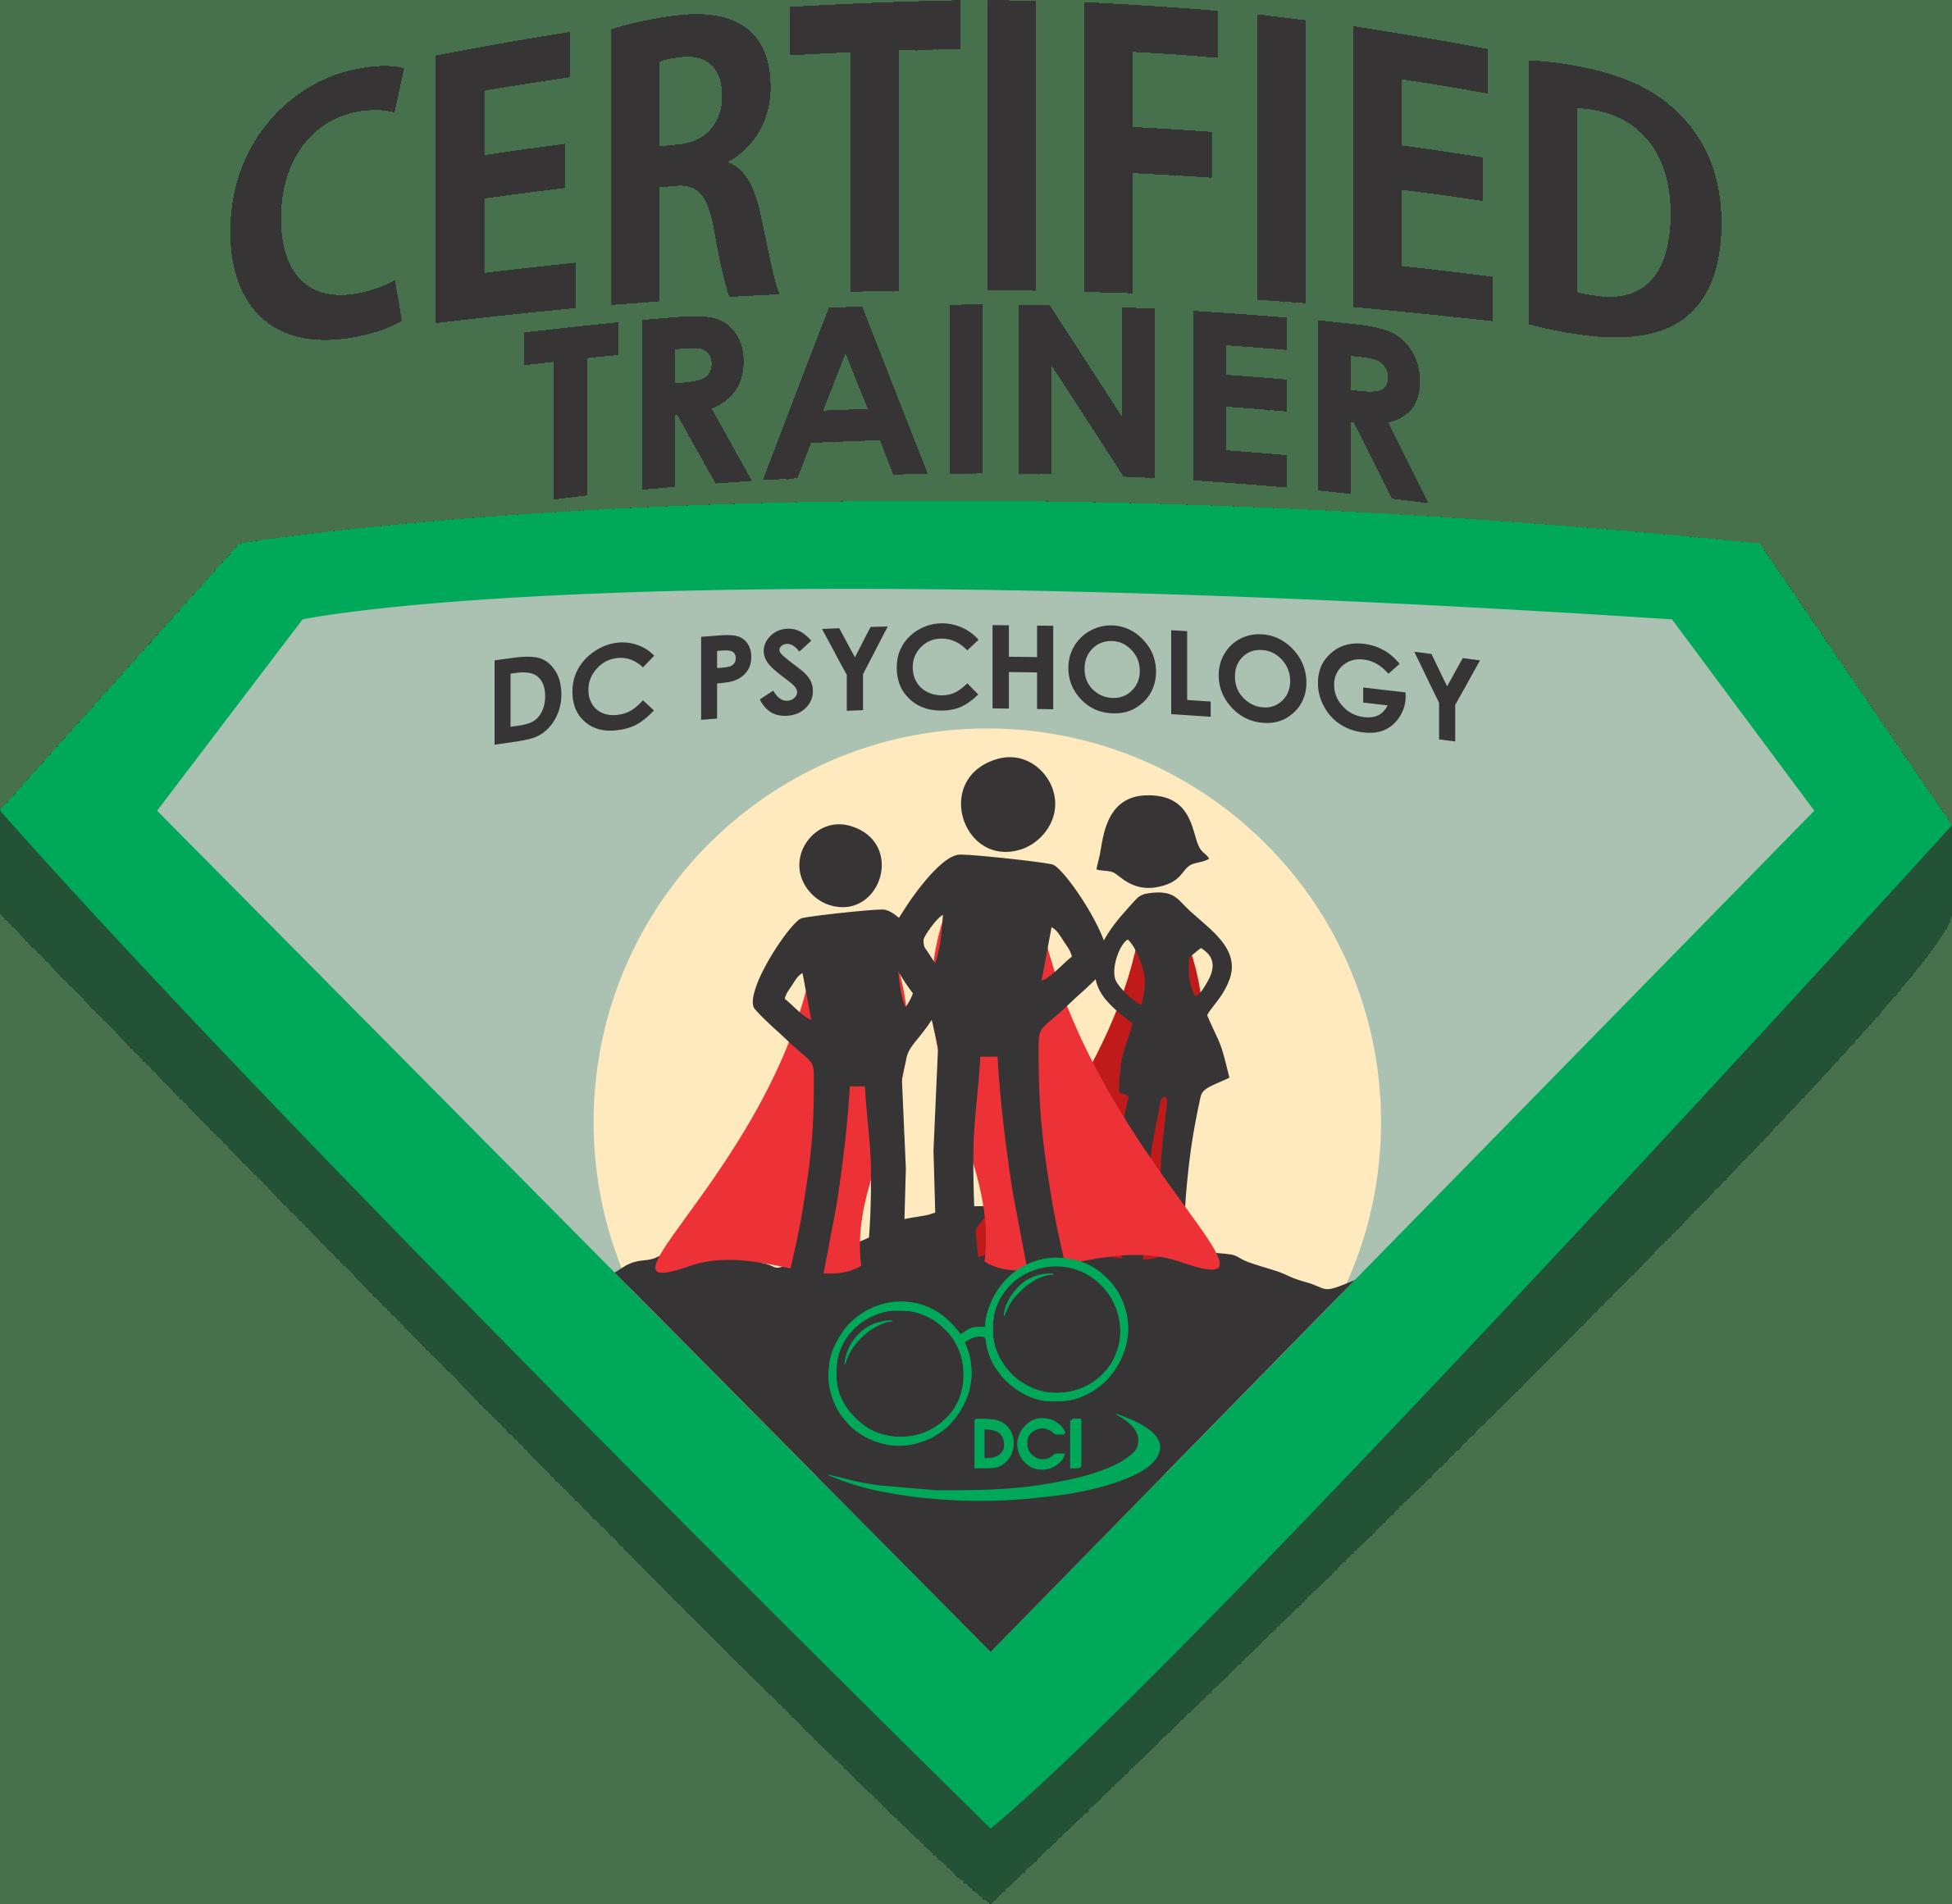 Achievement-Level-Certification-certified-trainer